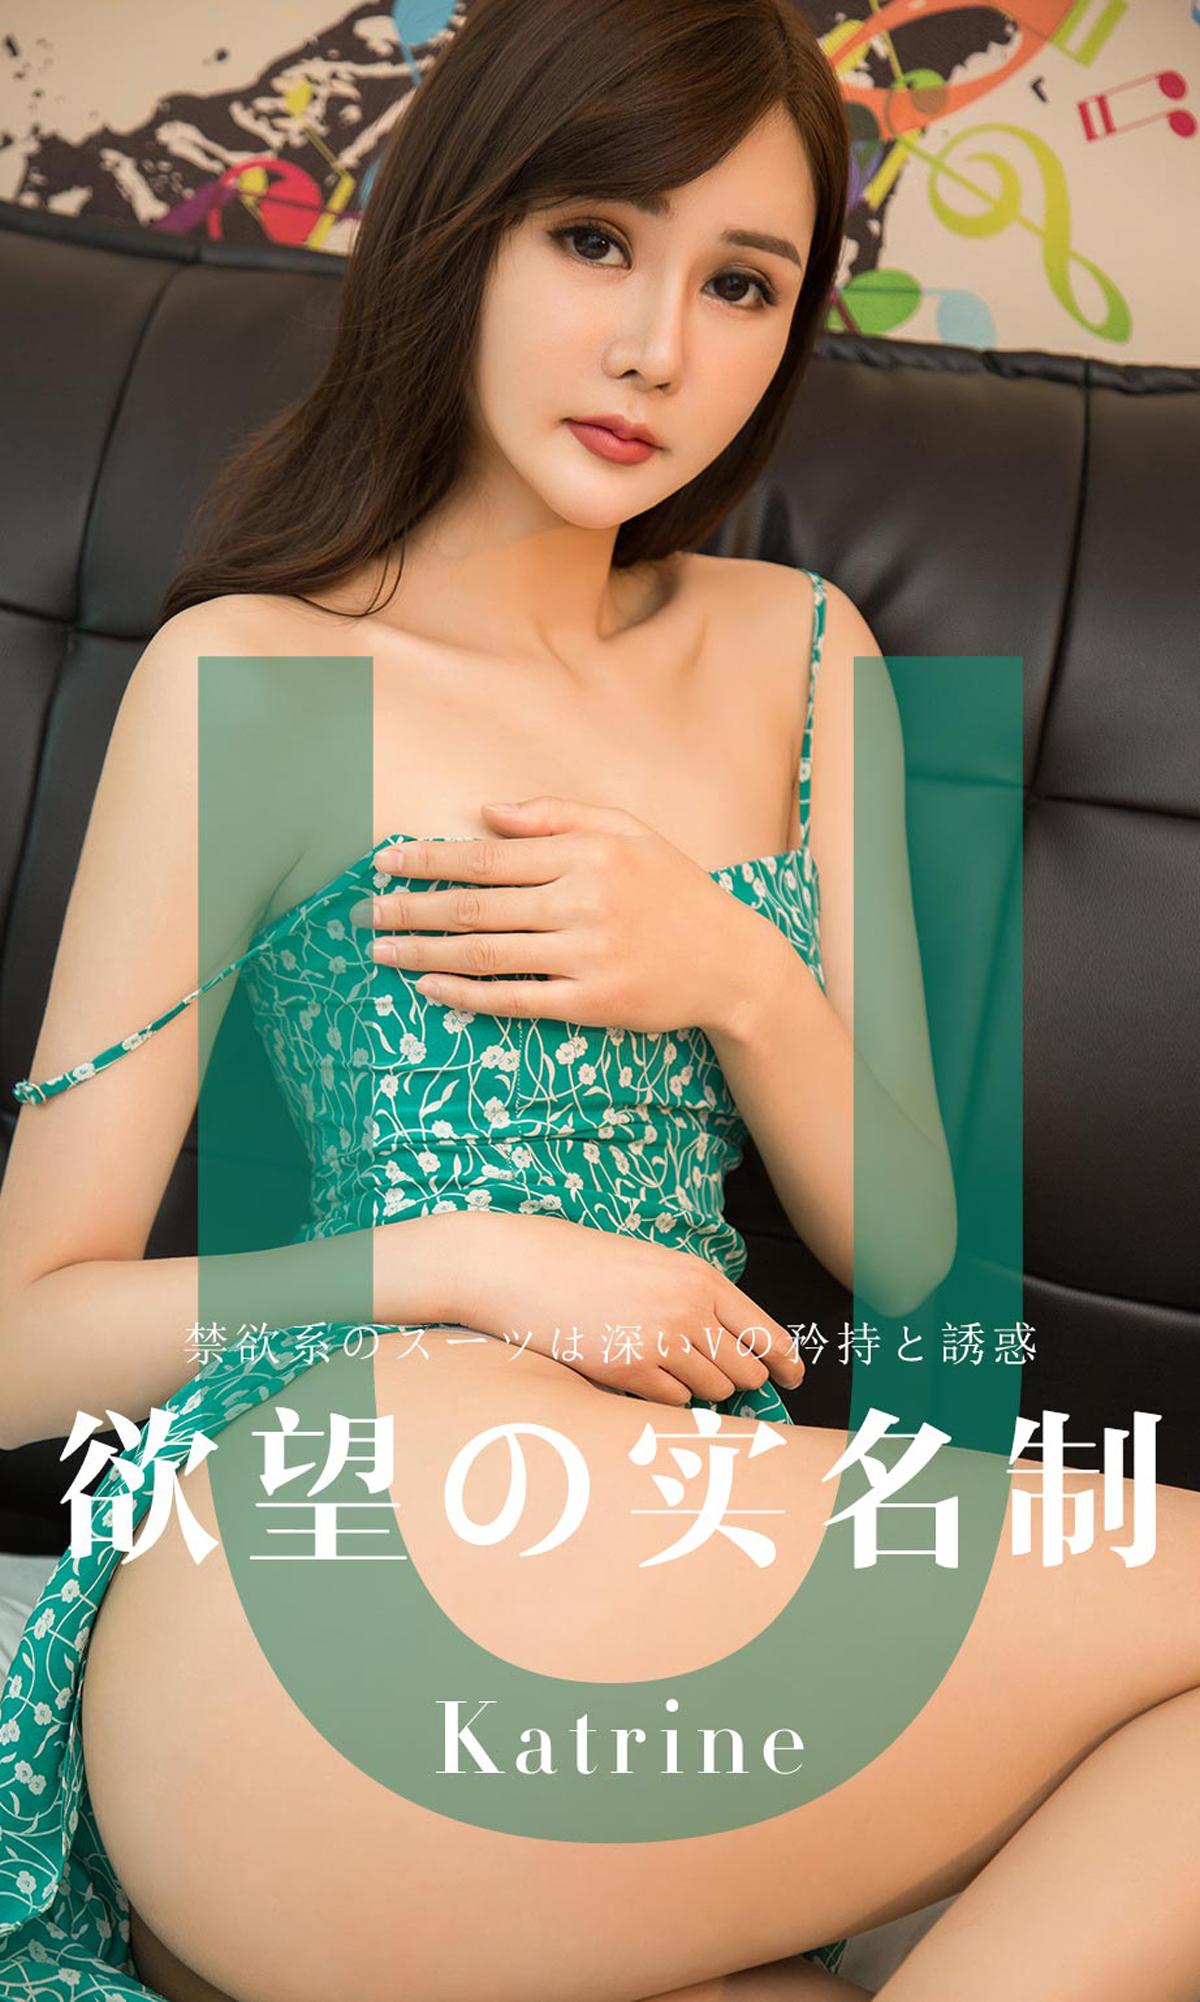 [Ugirls]爱尤物 No.1423 欲望实名制 Katr